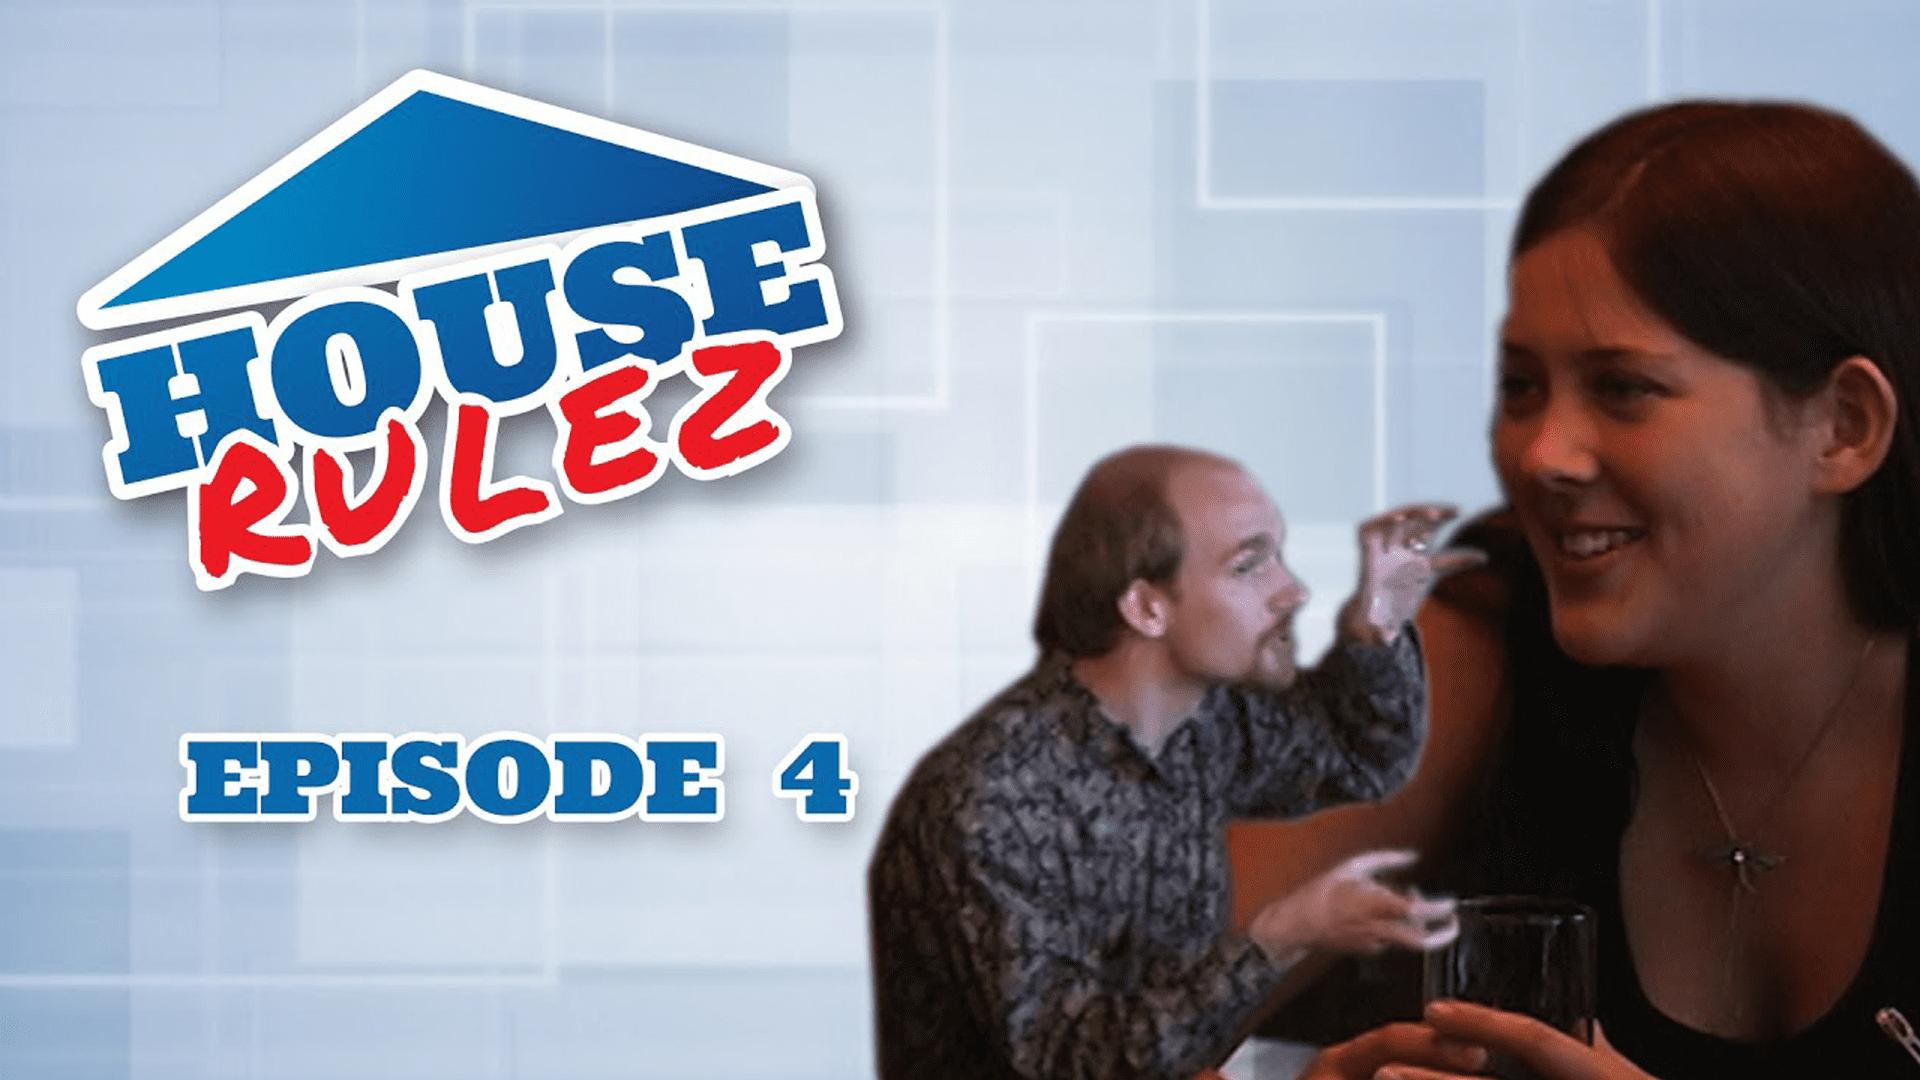 House Rulez Episode 4